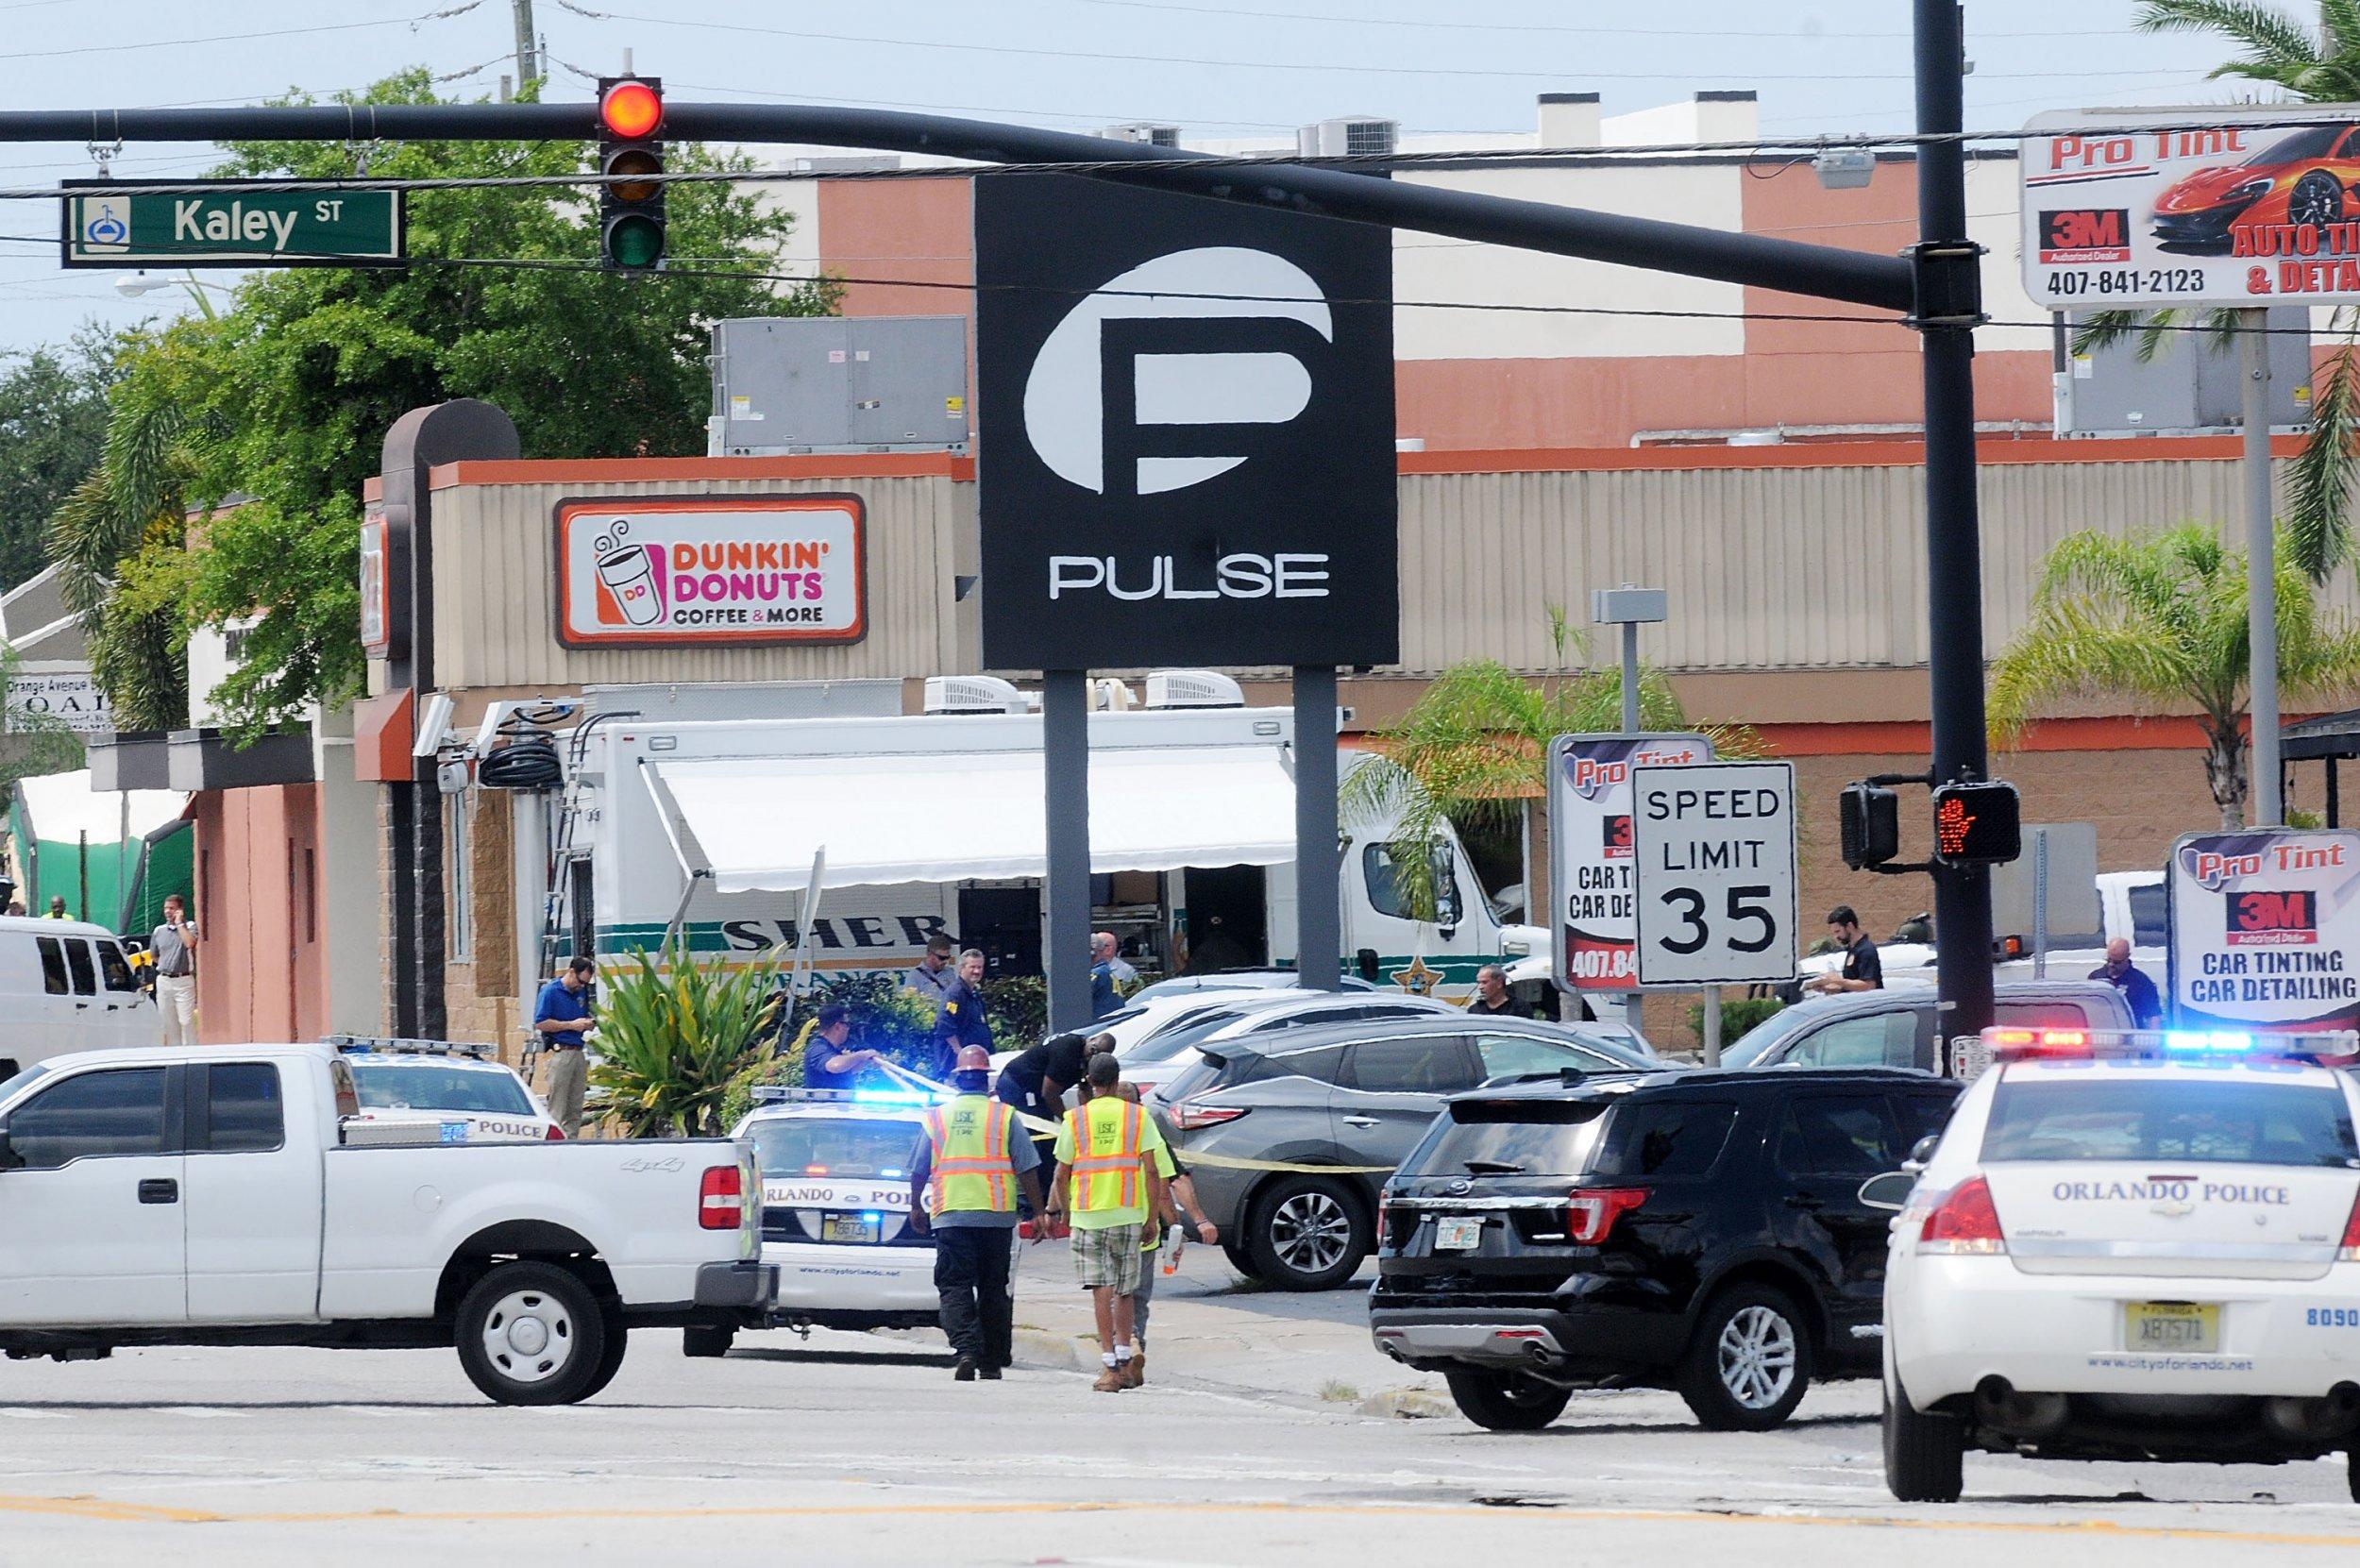 Pulse nightclub in Orlando, Florida